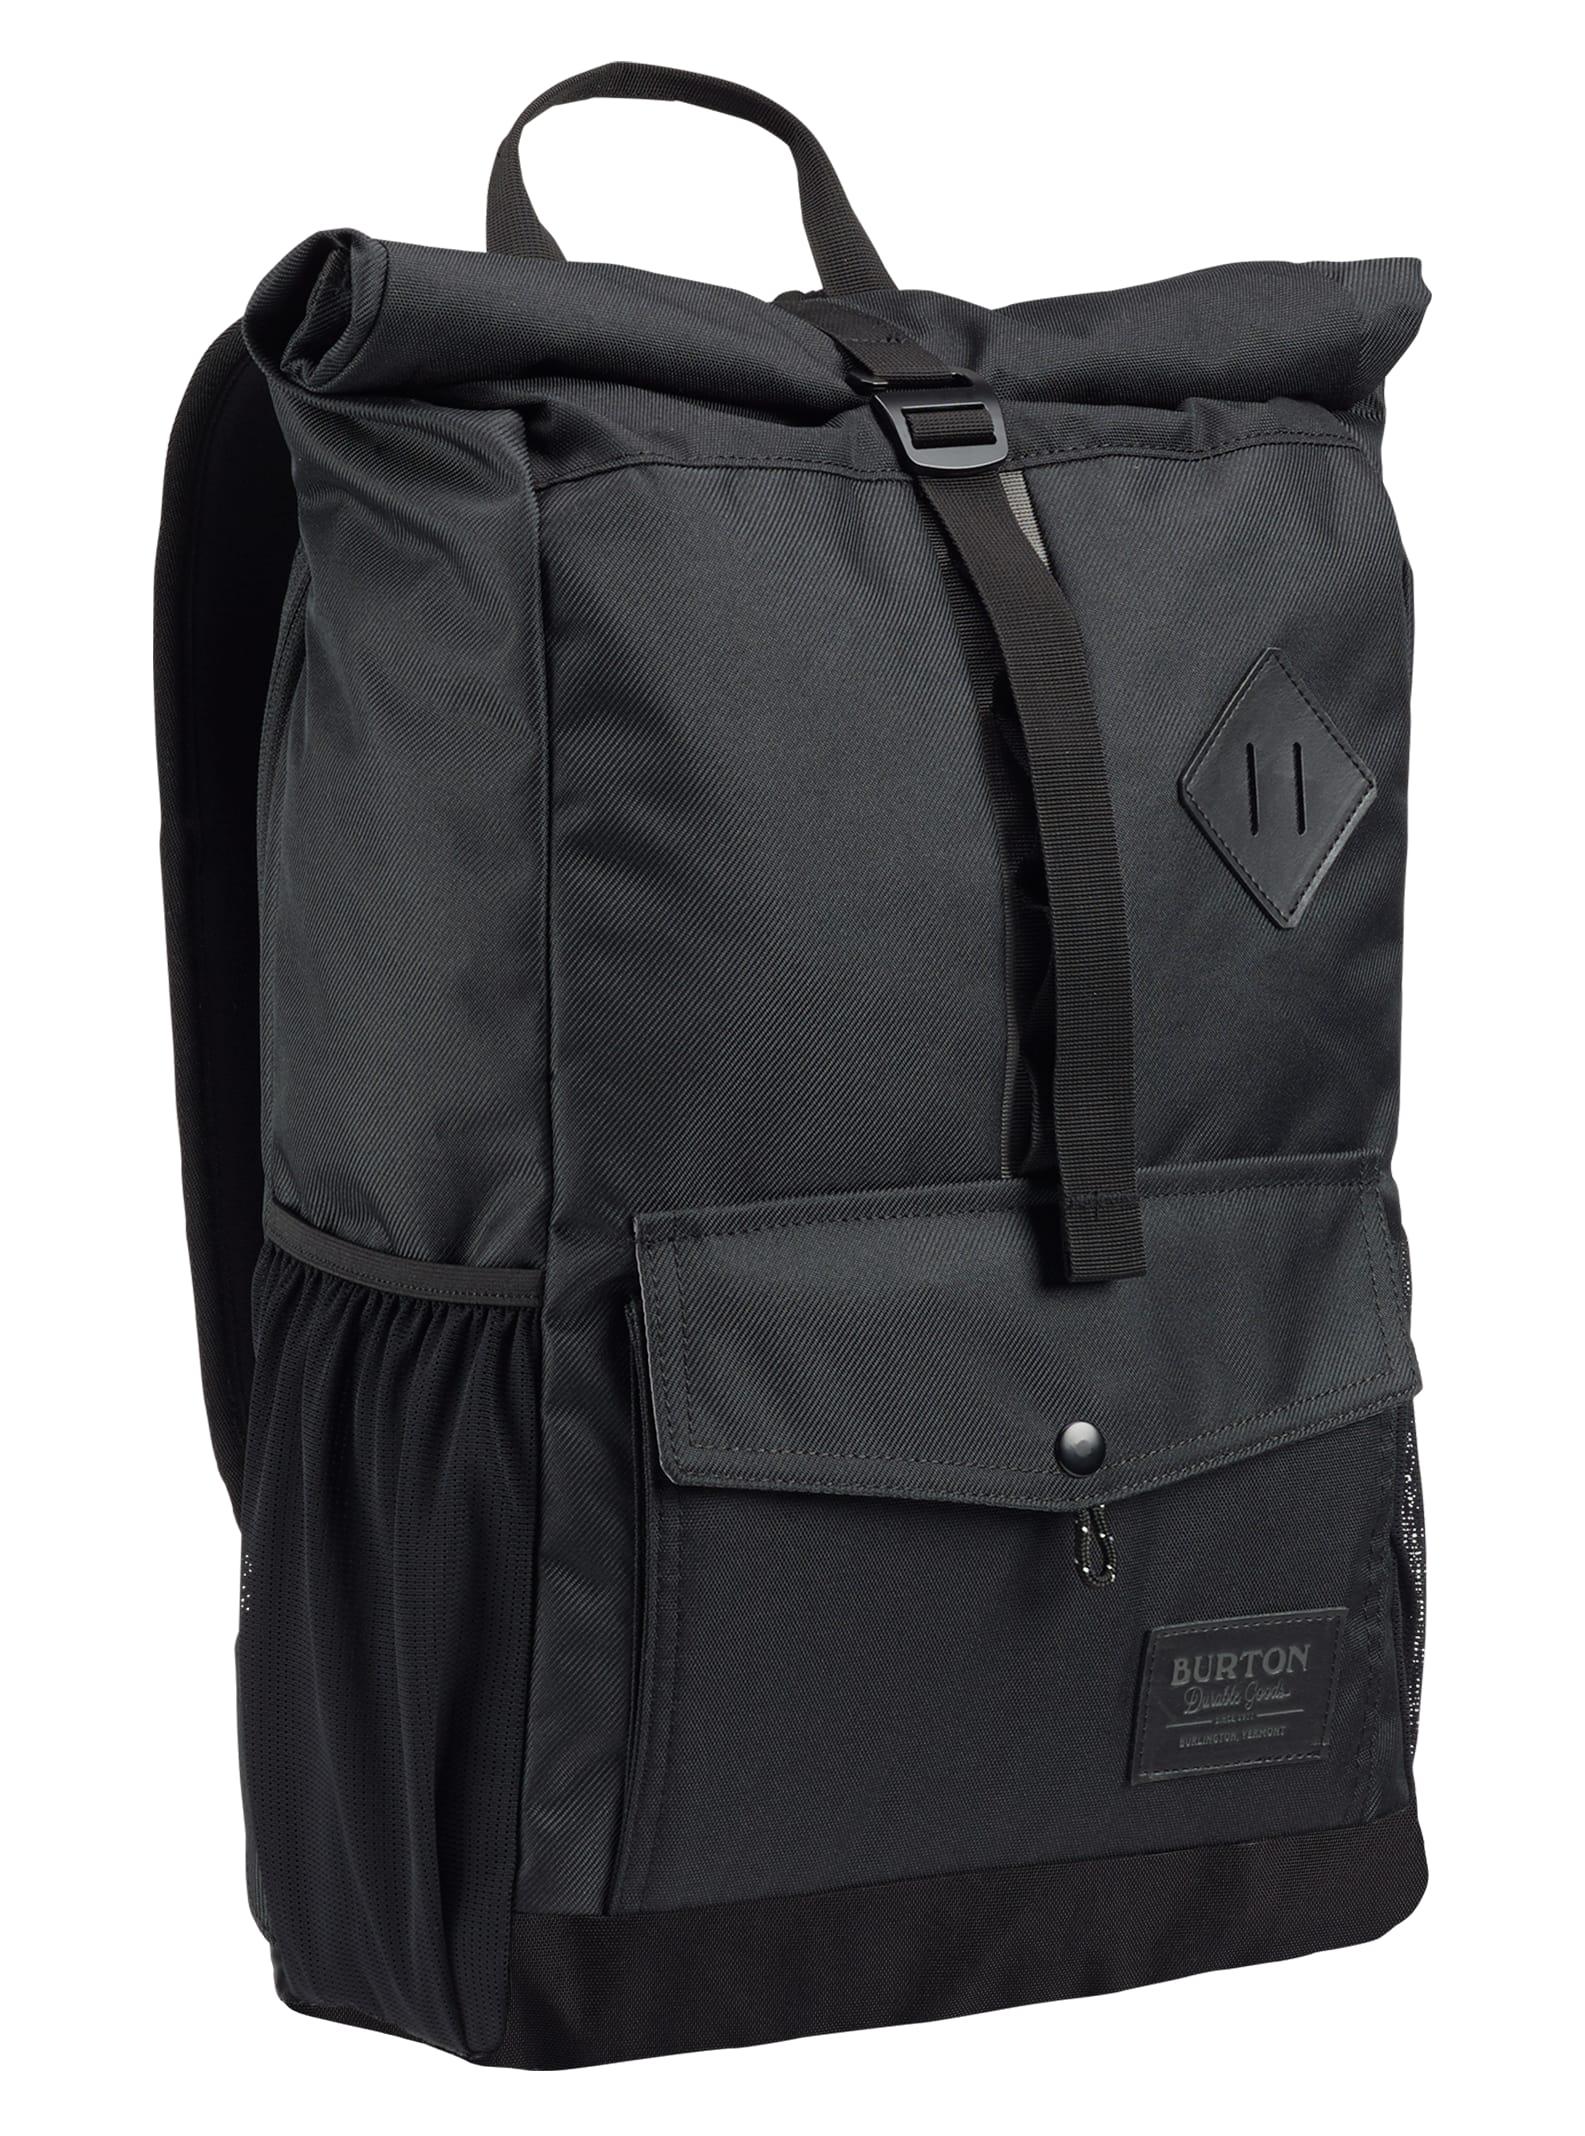 580a64d0f9f Backpacks   Burton Snowboards